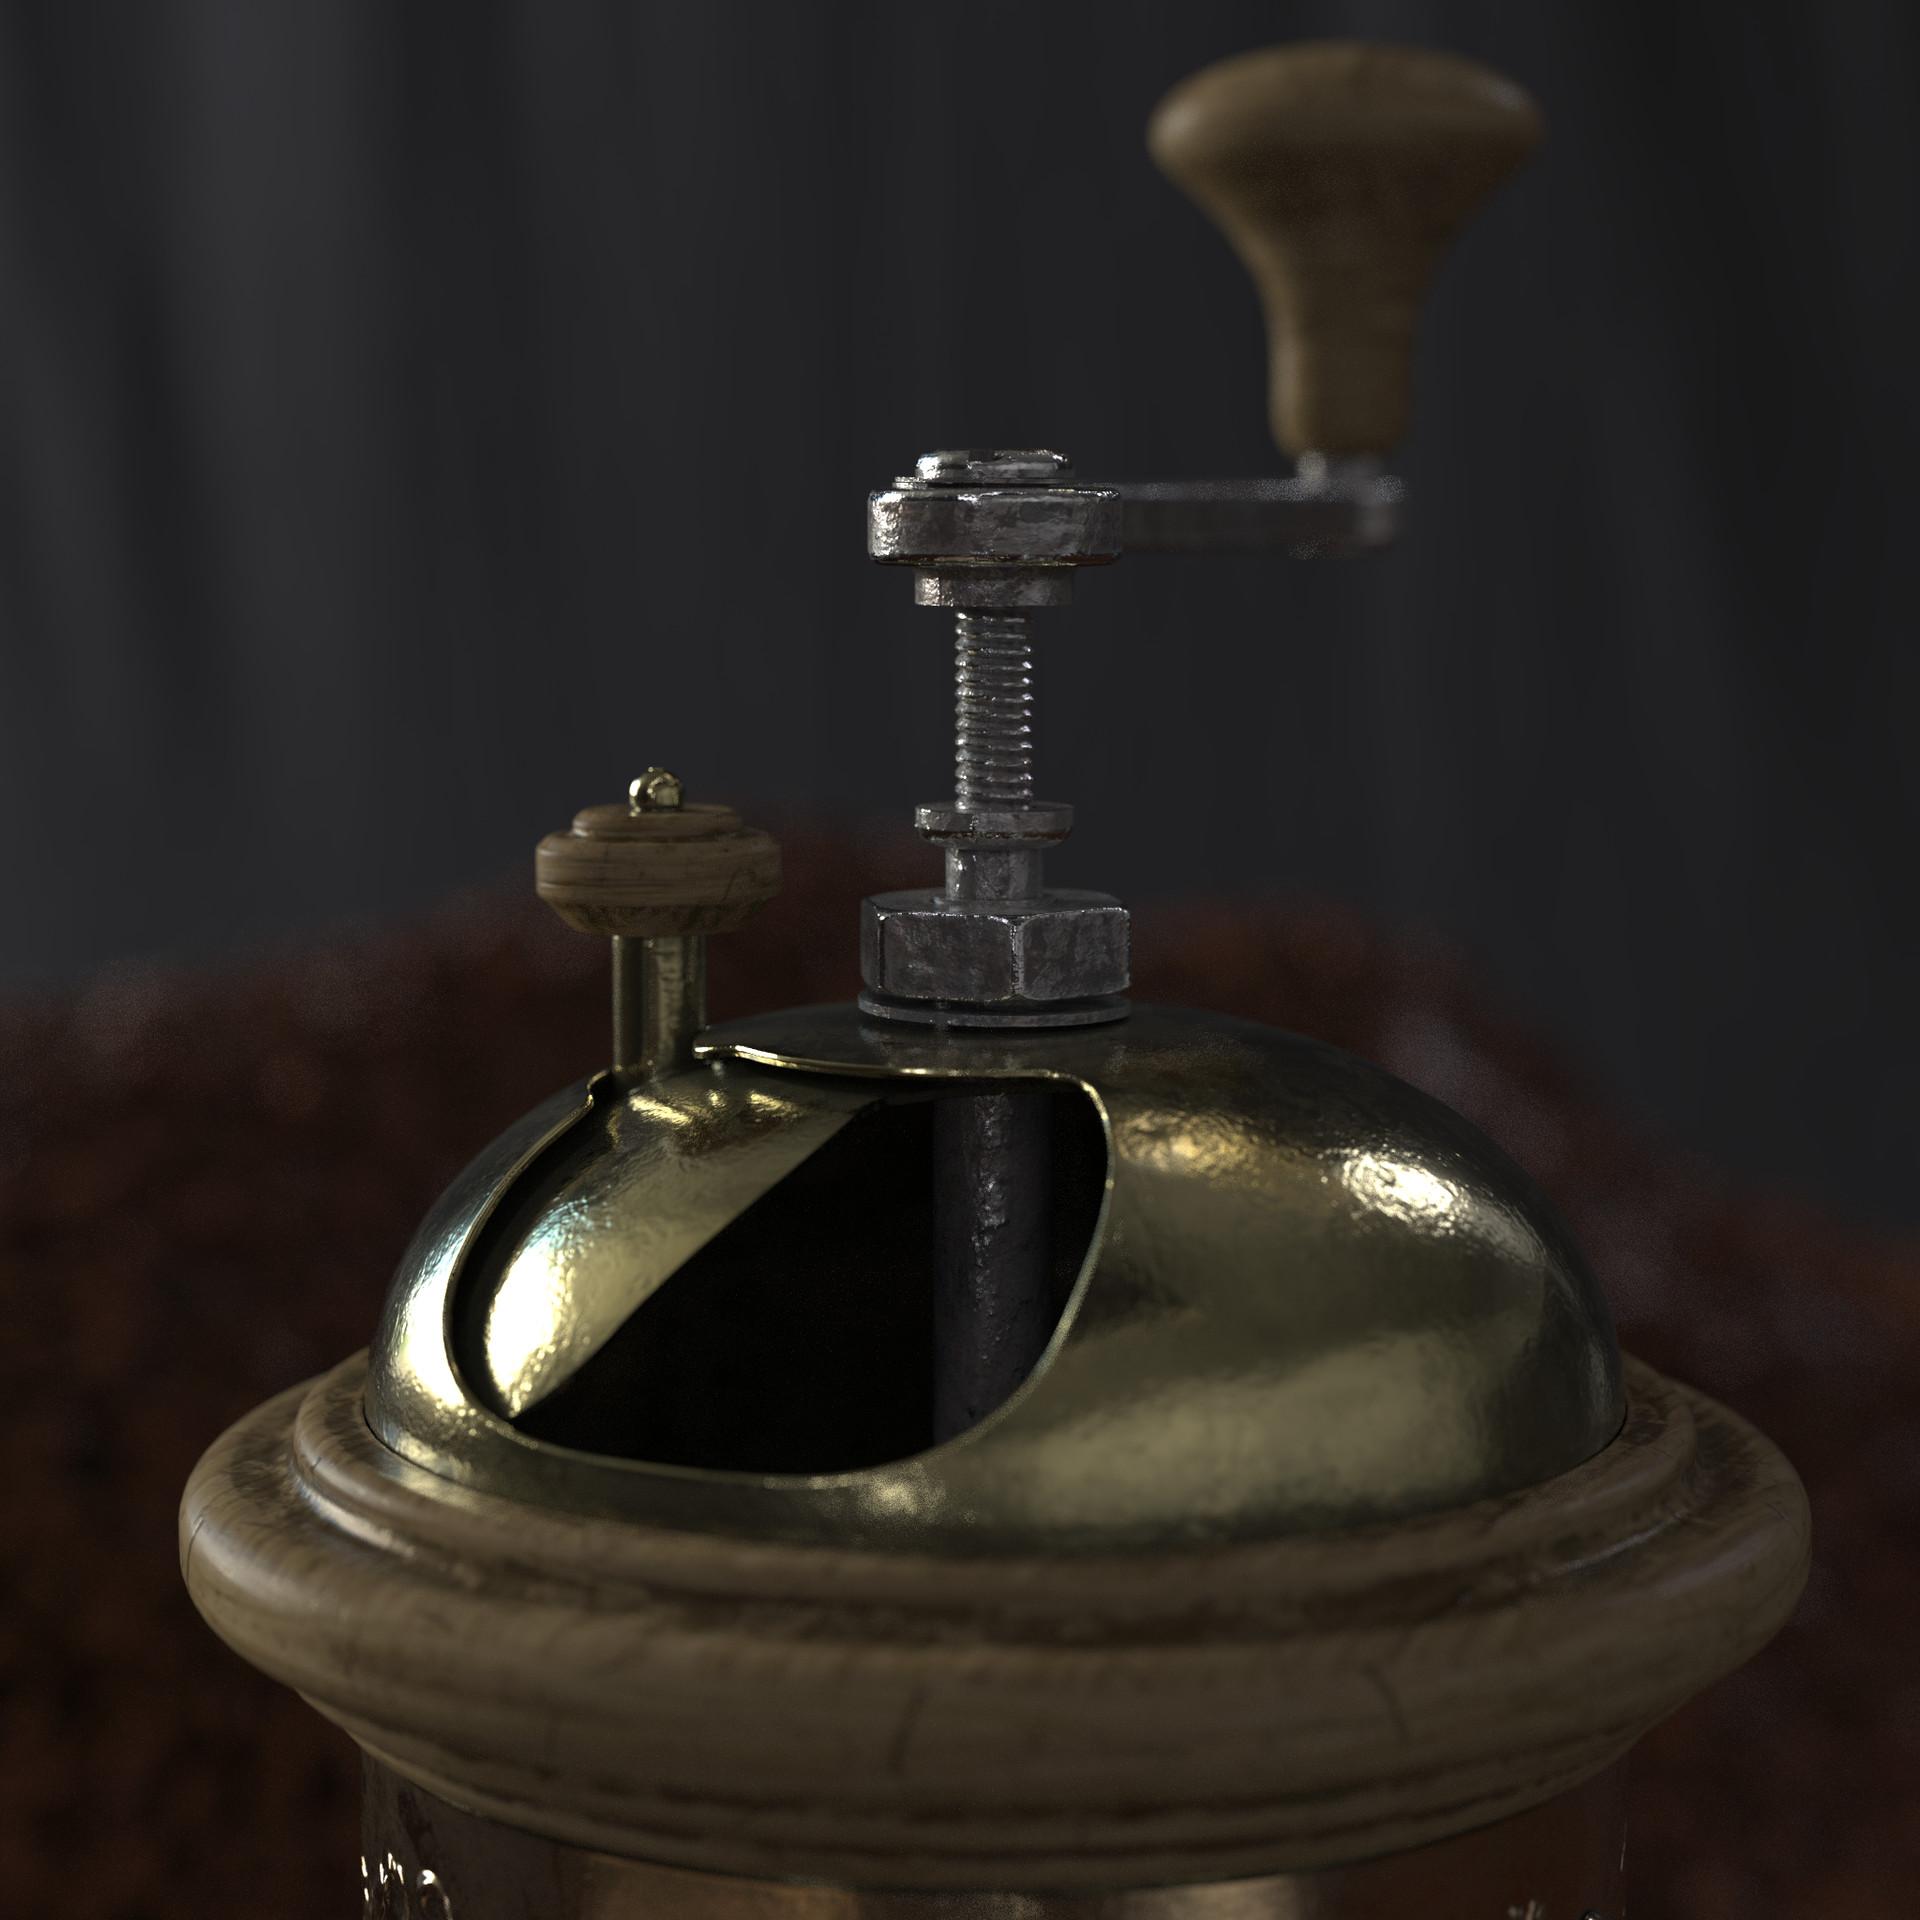 Cem tezcan anova coffee 00005